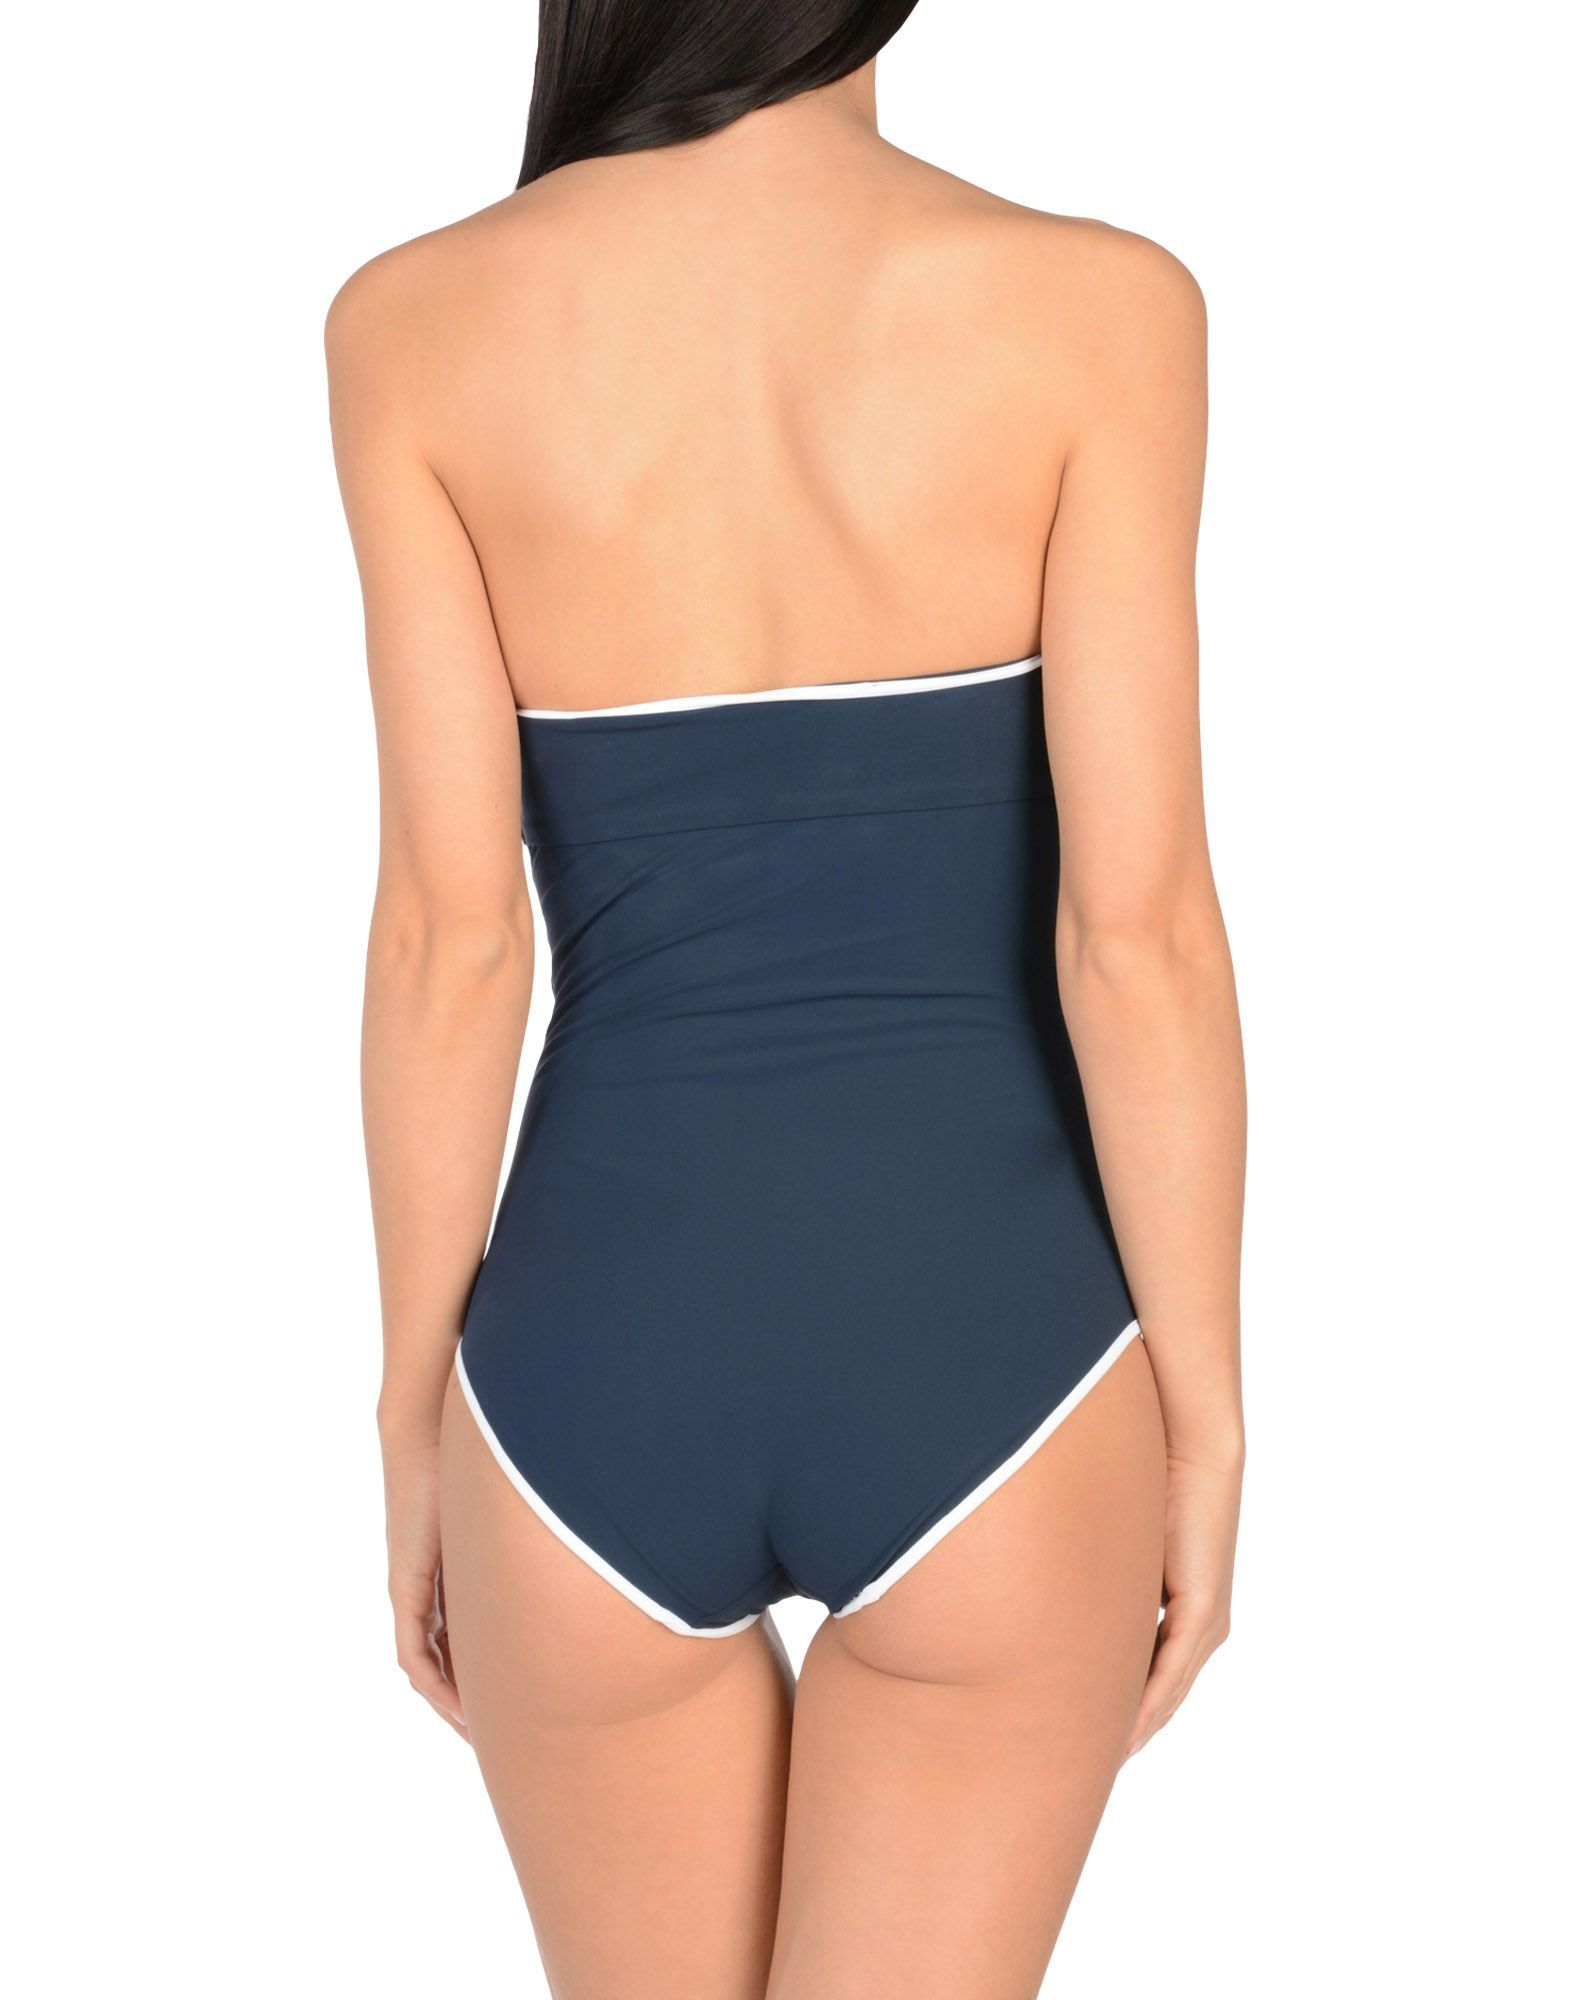 Gentryportofino Dark Blue Bandeau Swimsuit